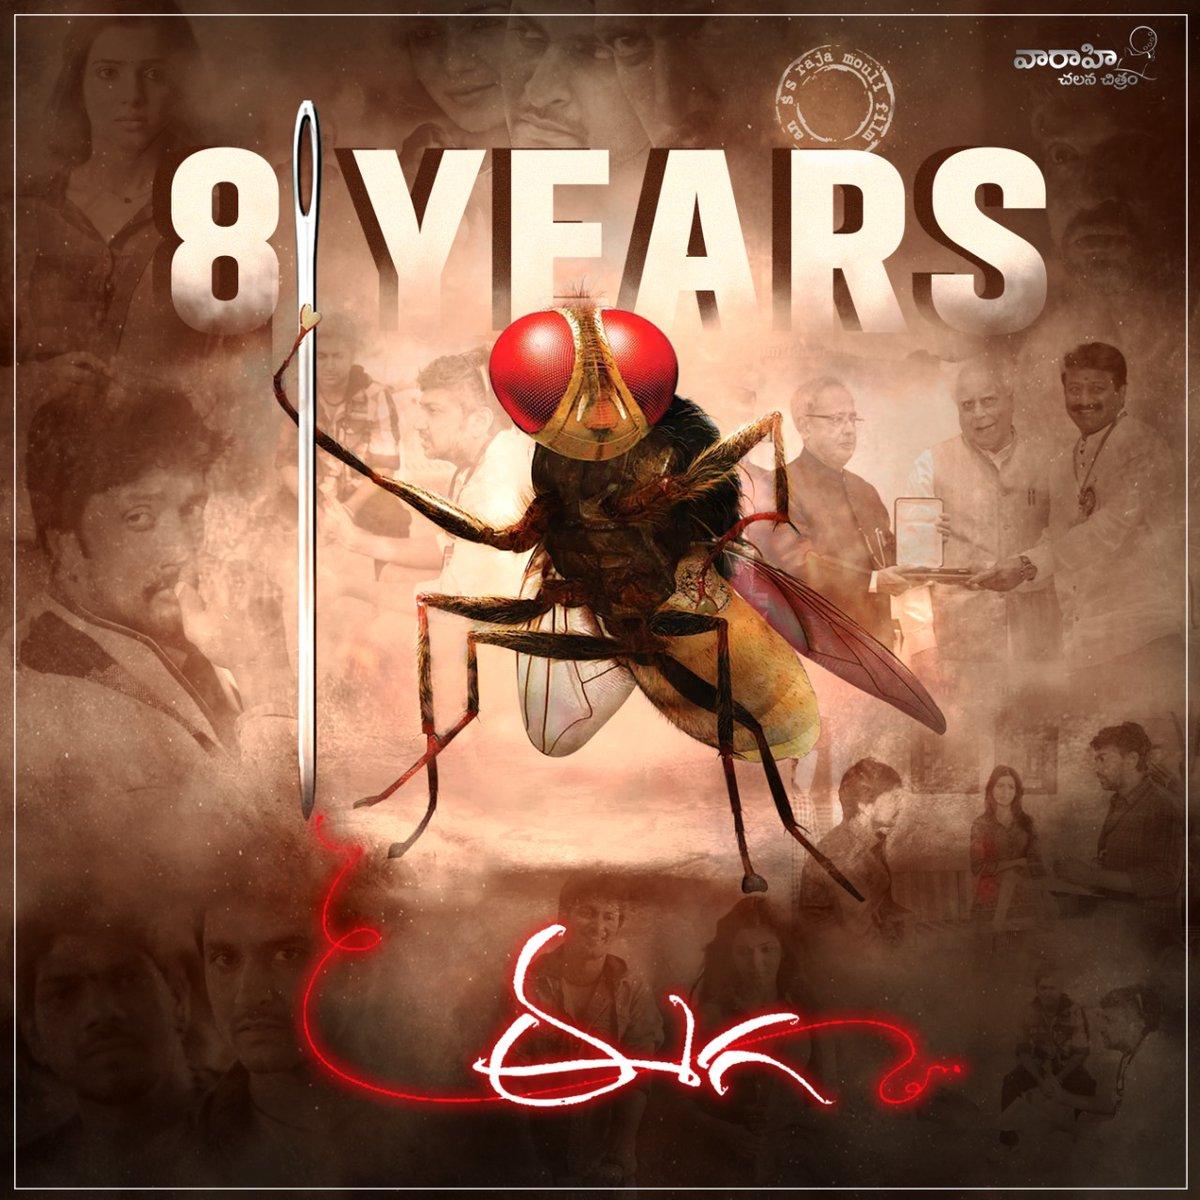 #8YearsForEega ❤️  Watch the full movie here: https://t.co/U4VHhlRWsD   @ssrajamouli @KicchaSudeep @NameisNani @Samanthaprabhu2  @mmkeeravaani @DOPSenthilKumar @VelRecordsIndia @VaaraahiCC @SaiKorrapati_ #Eega https://t.co/dQSvFAwn1w